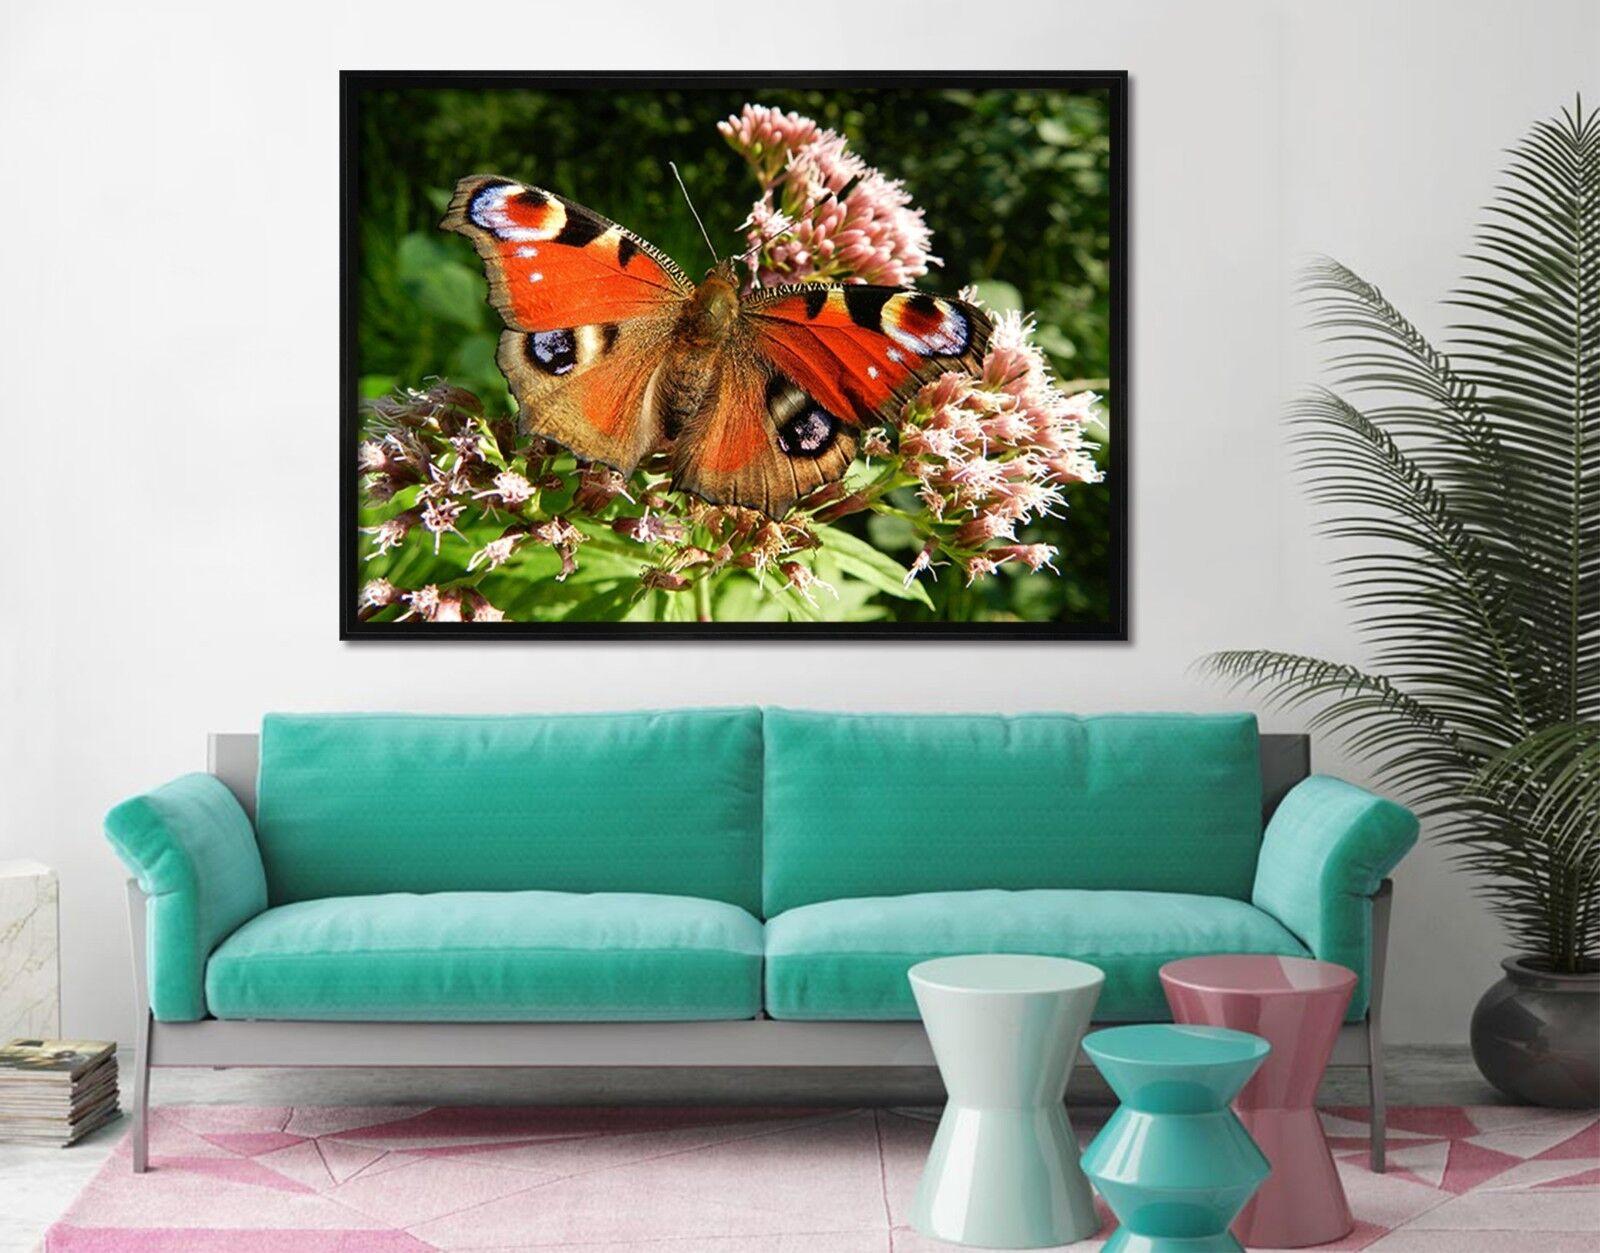 3D Mariposa Flor 2 Póster Enmarcado Decoración del Hogar Pintura de Impresión Arte AJ Wallpaper